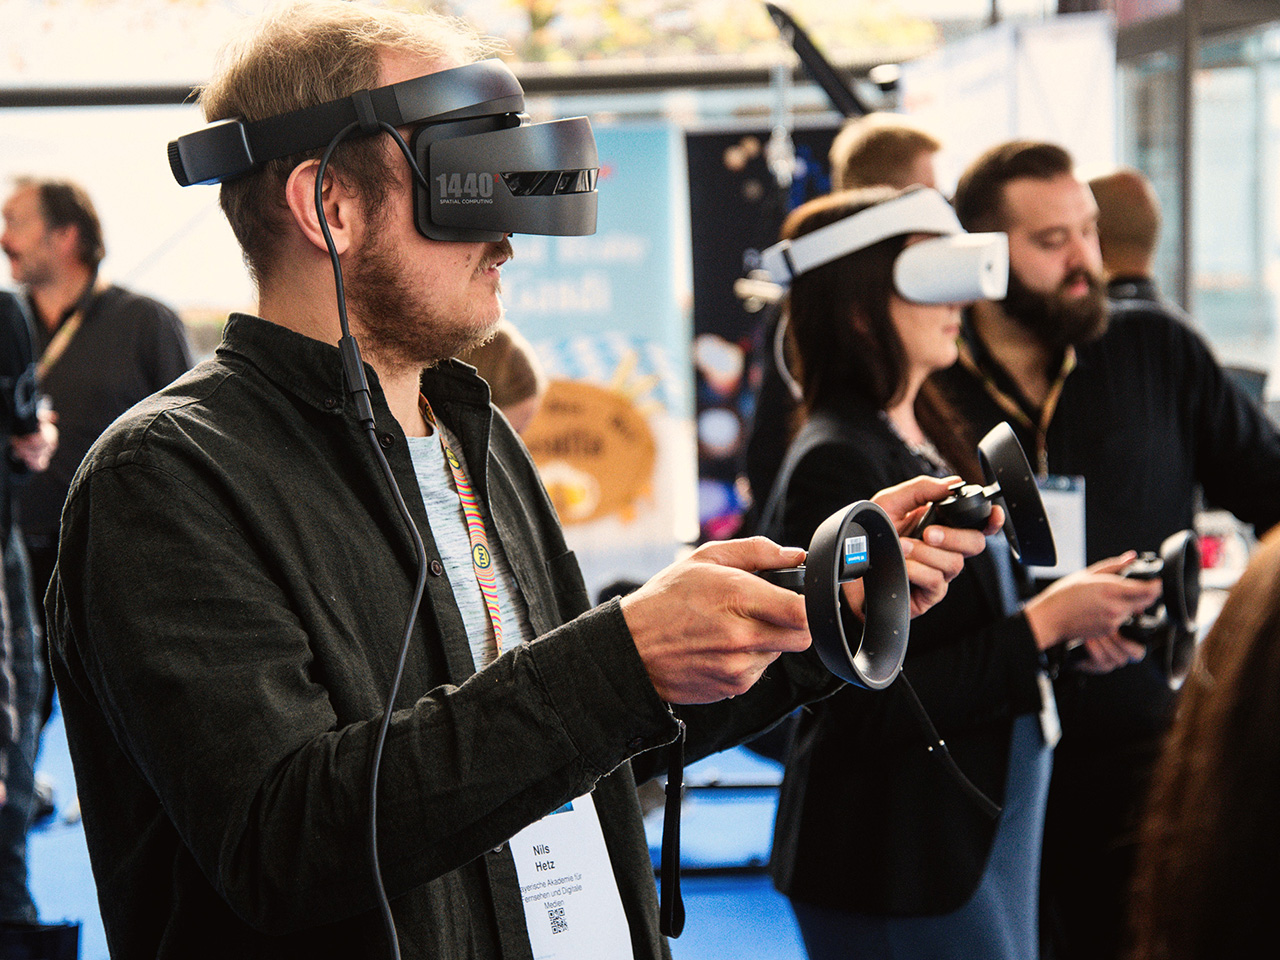 A man is using a Virtual Reality kit